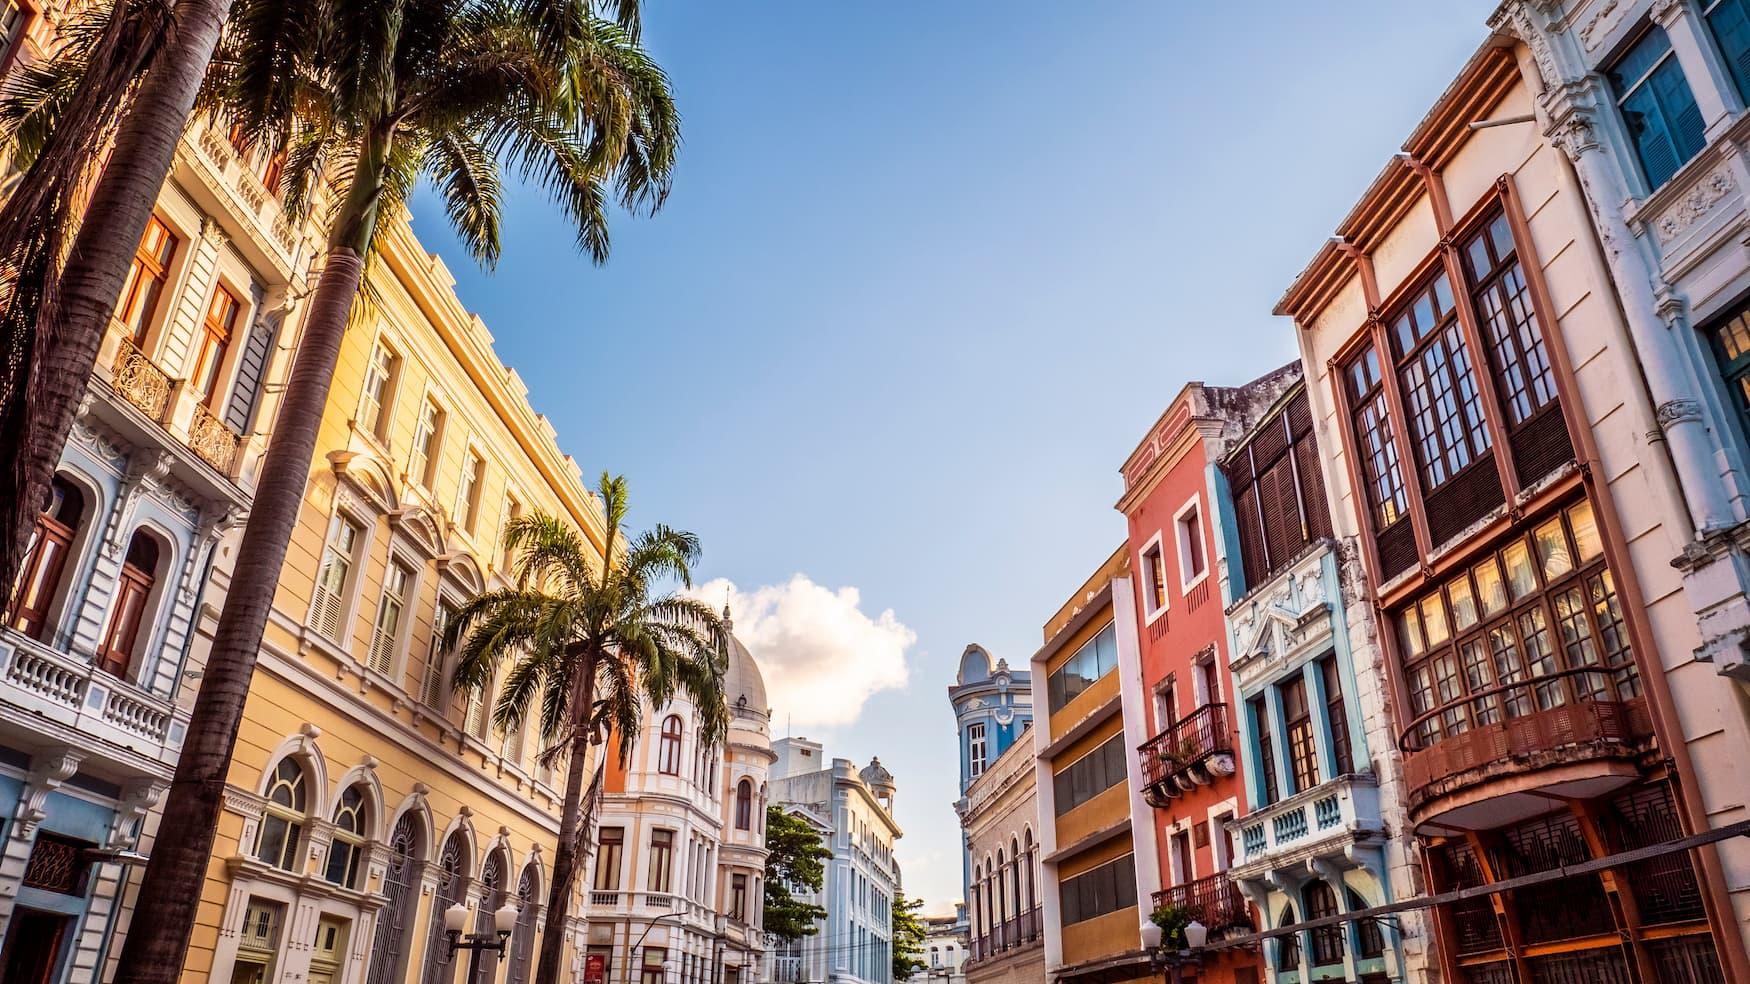 Altbauten in Pernambuco in Recife, Brasilien